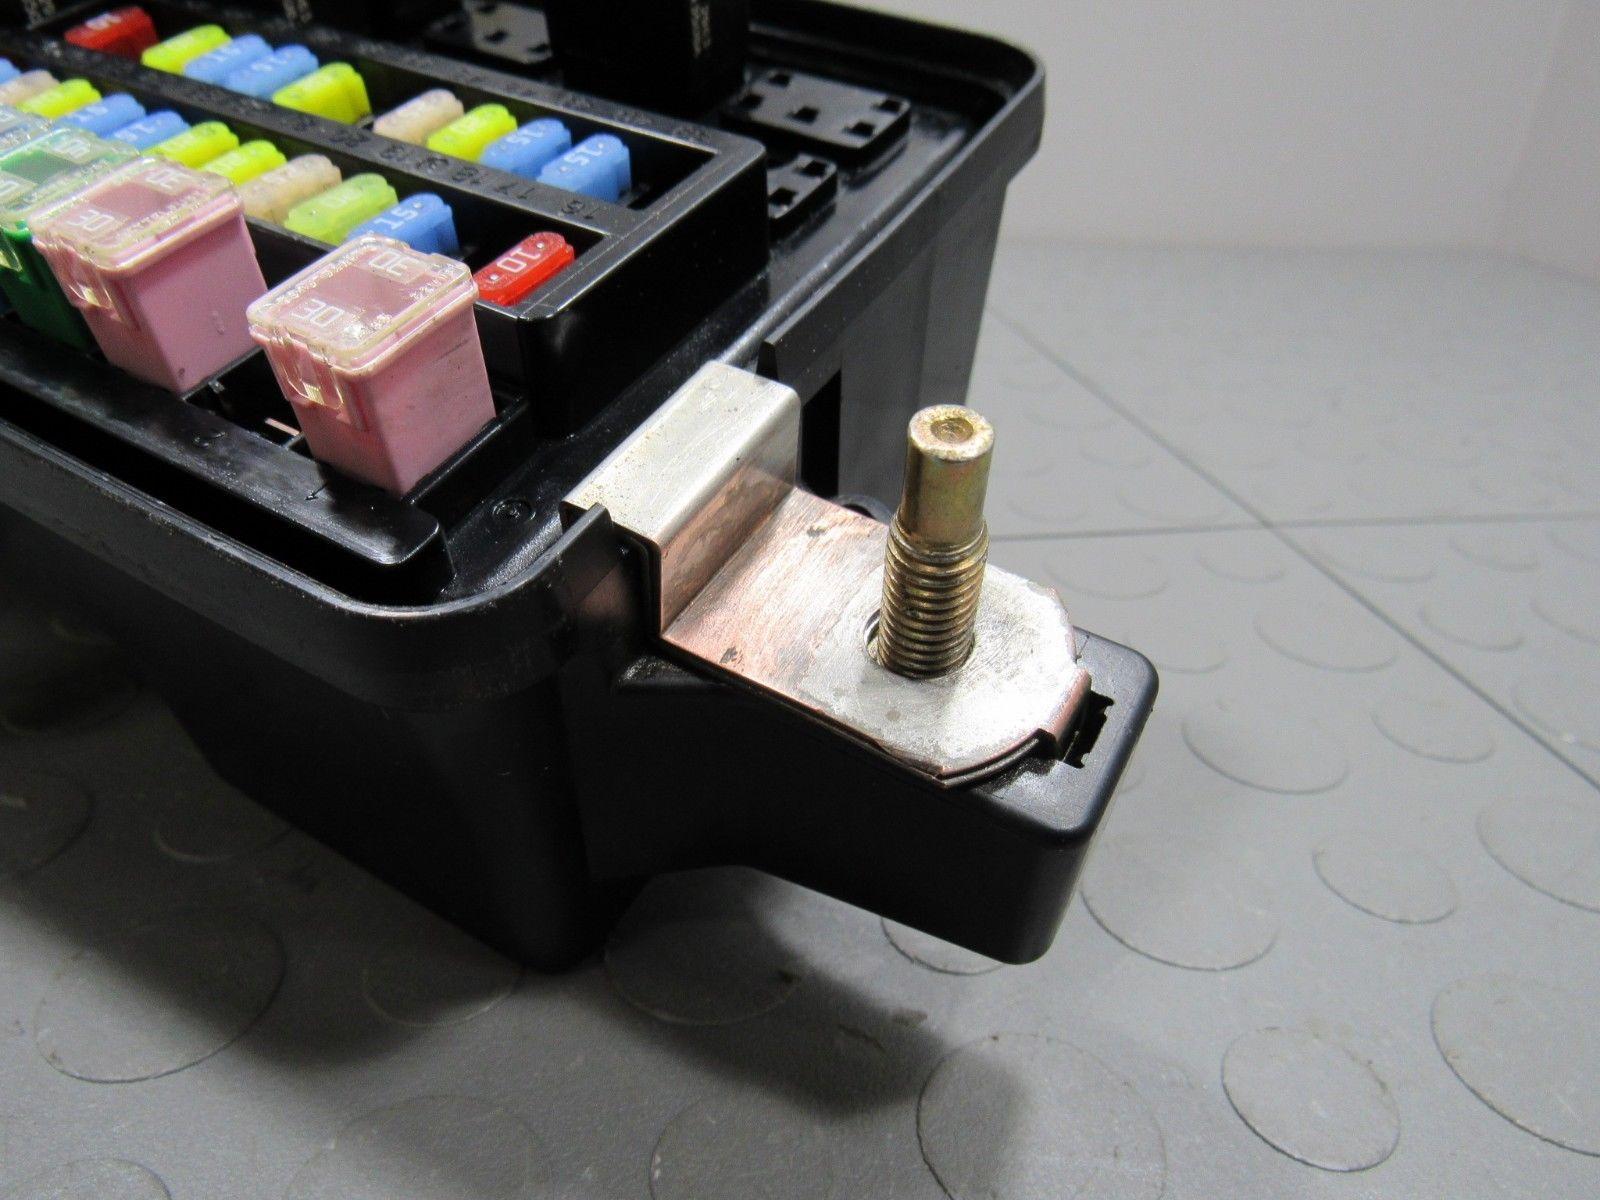 03 05 Dodge Ram Truck Ipm Integrated Power Module Fuse Block Box 56051040ad Ez